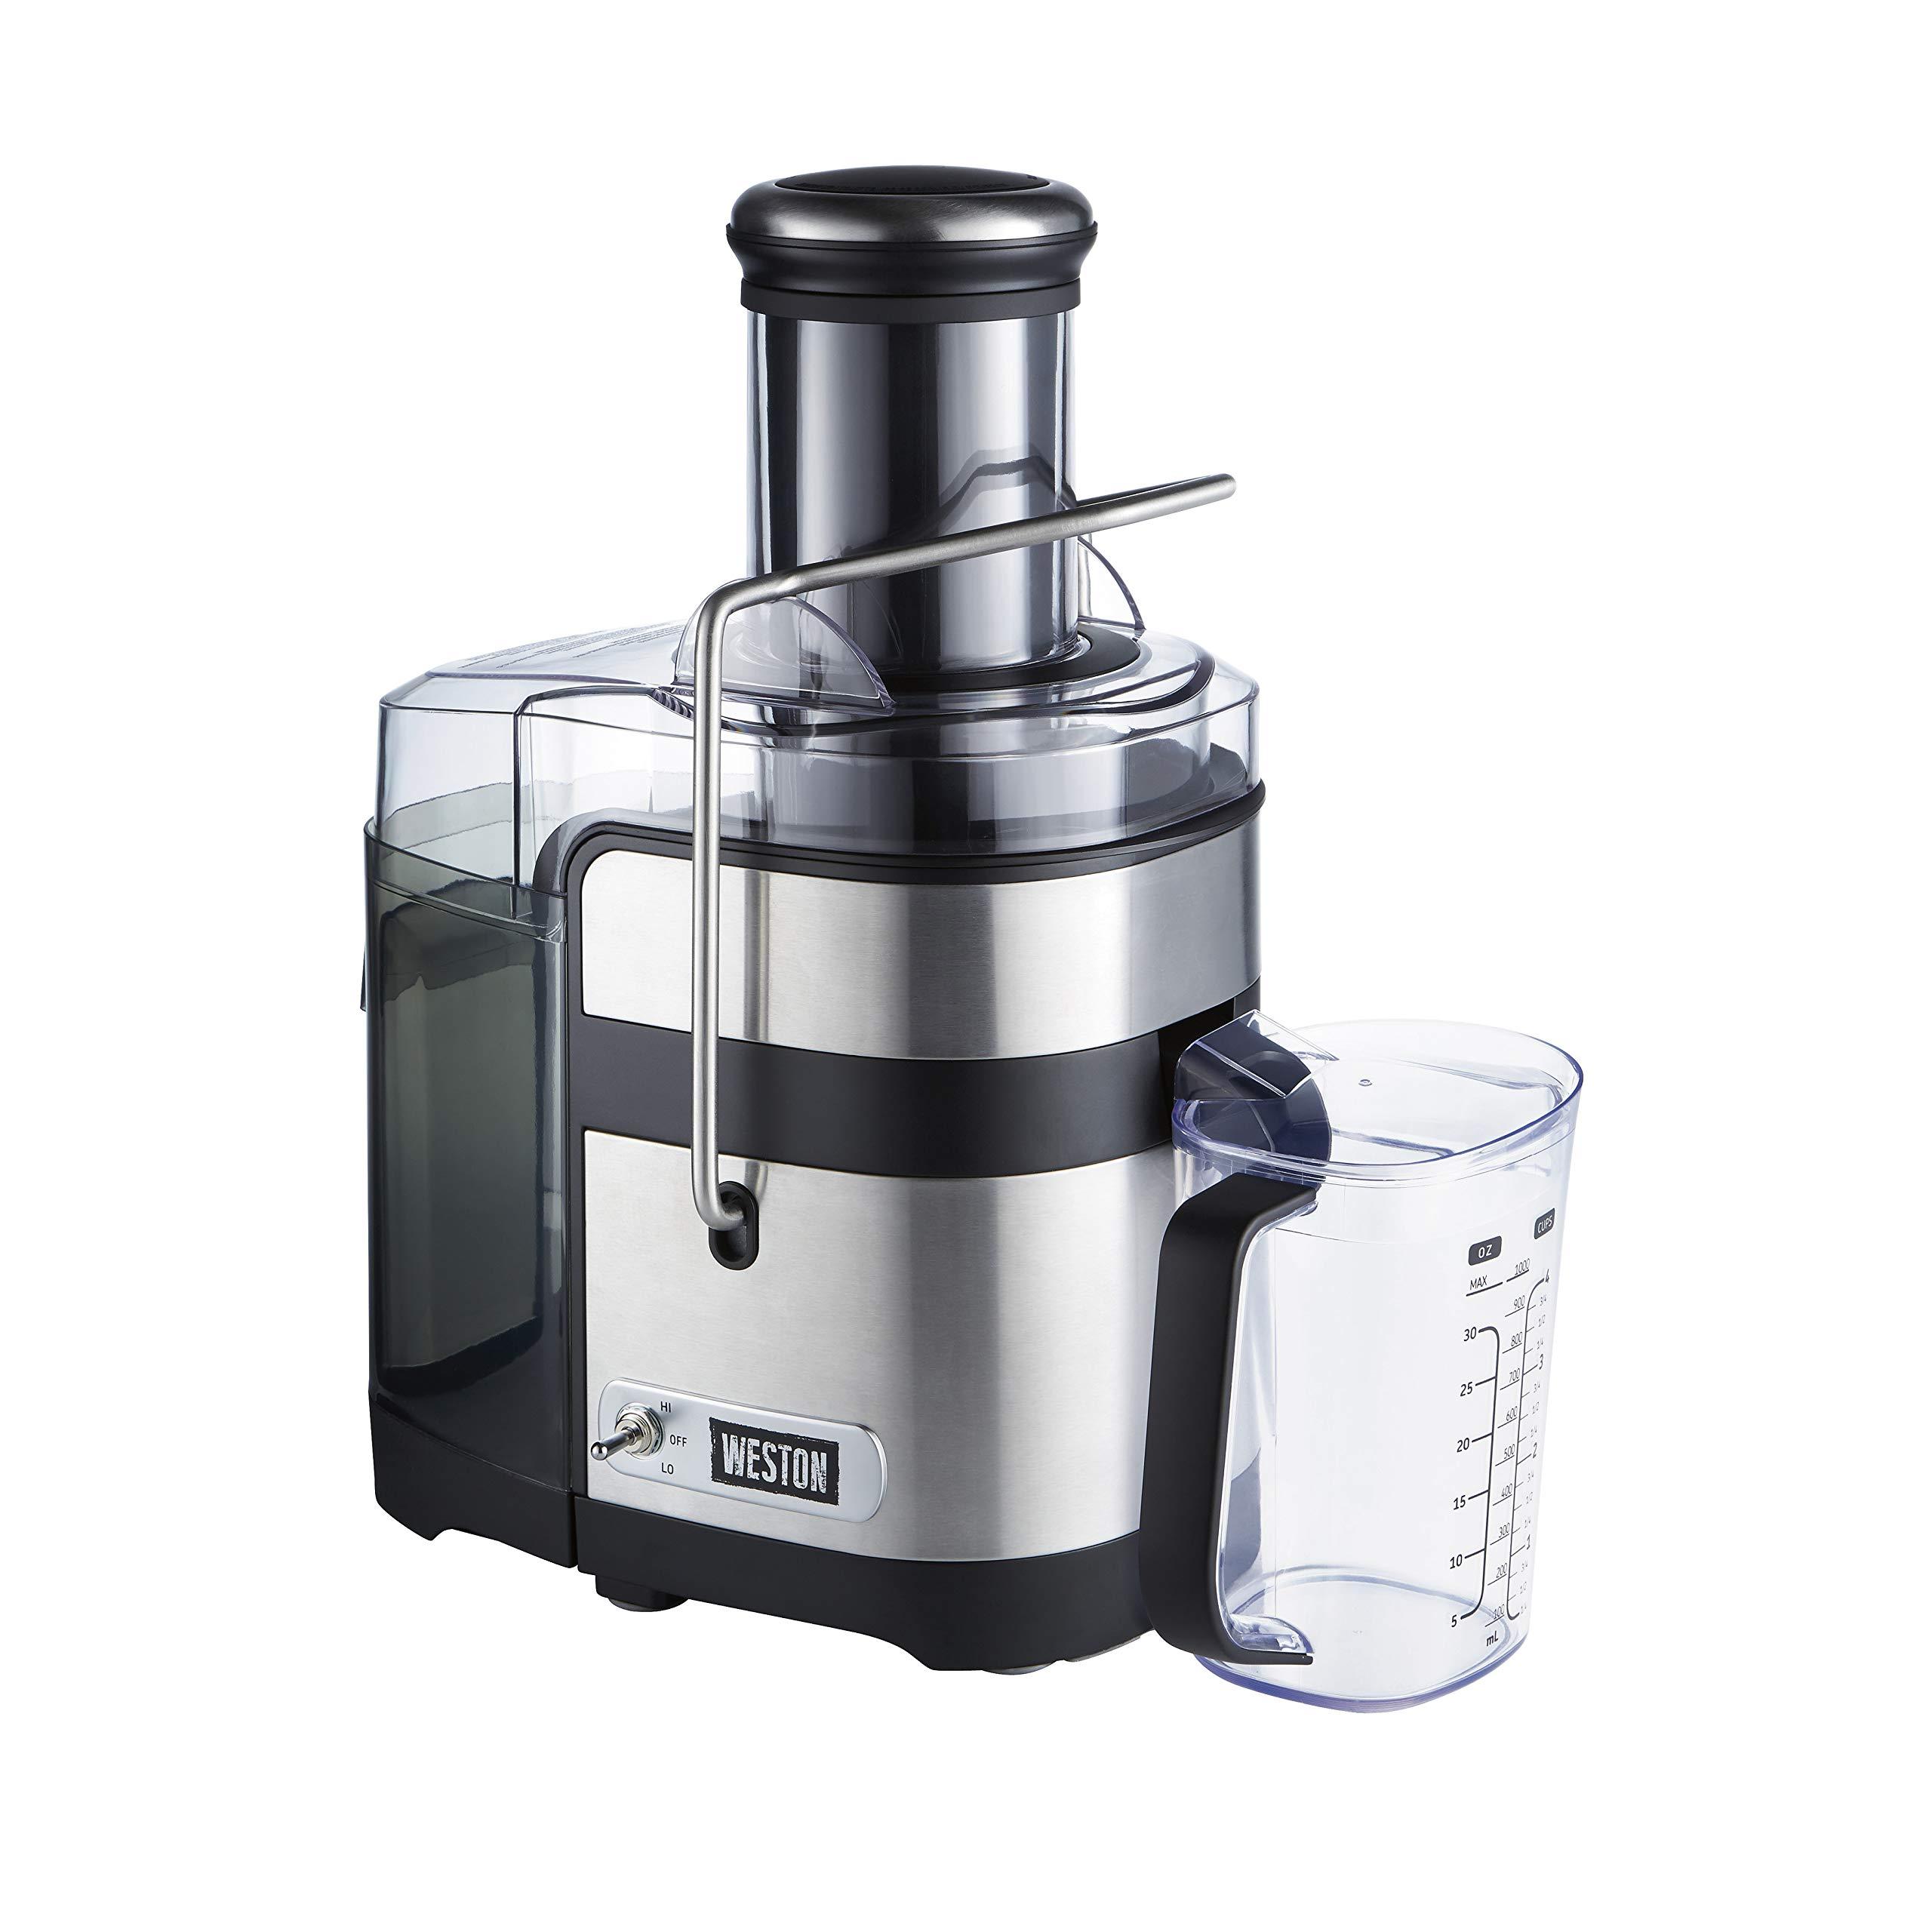 Weston 67902 Super Chute Juice Extractor, 34 oz, Silver